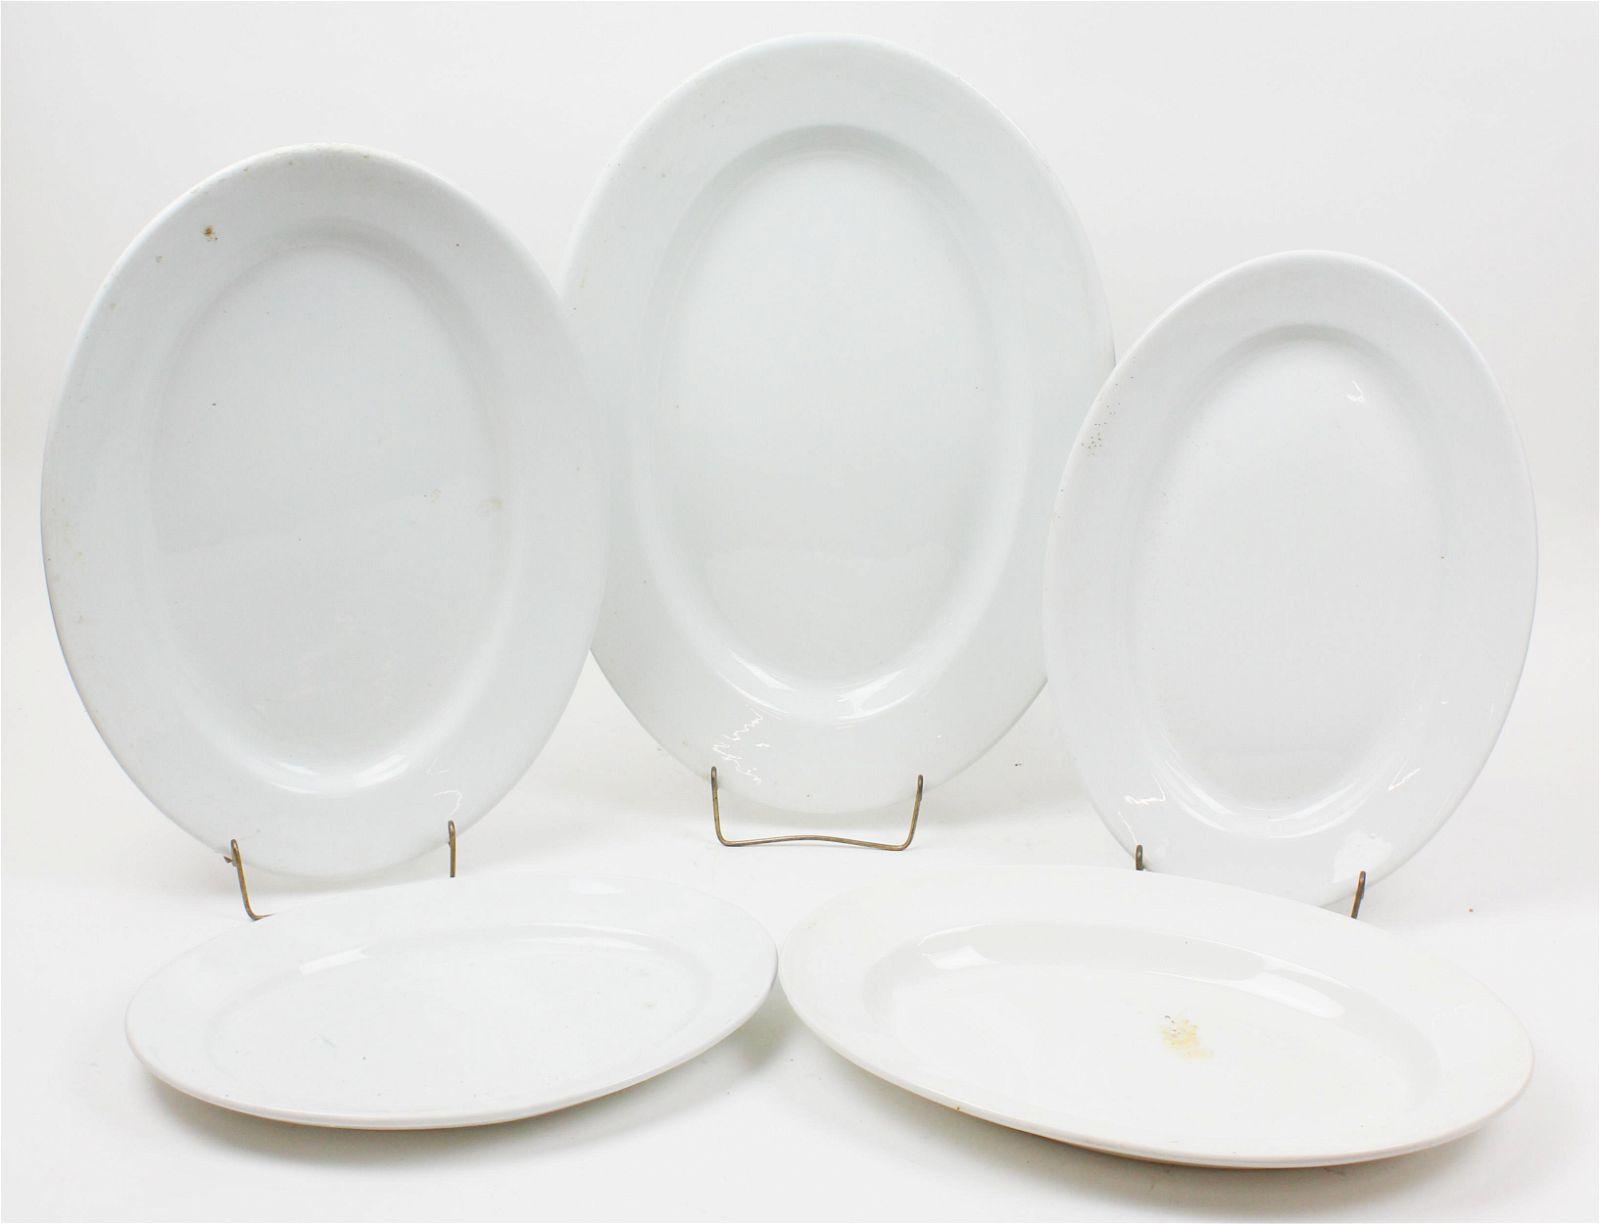 Nest of 5 English Ironstone Serving Platters